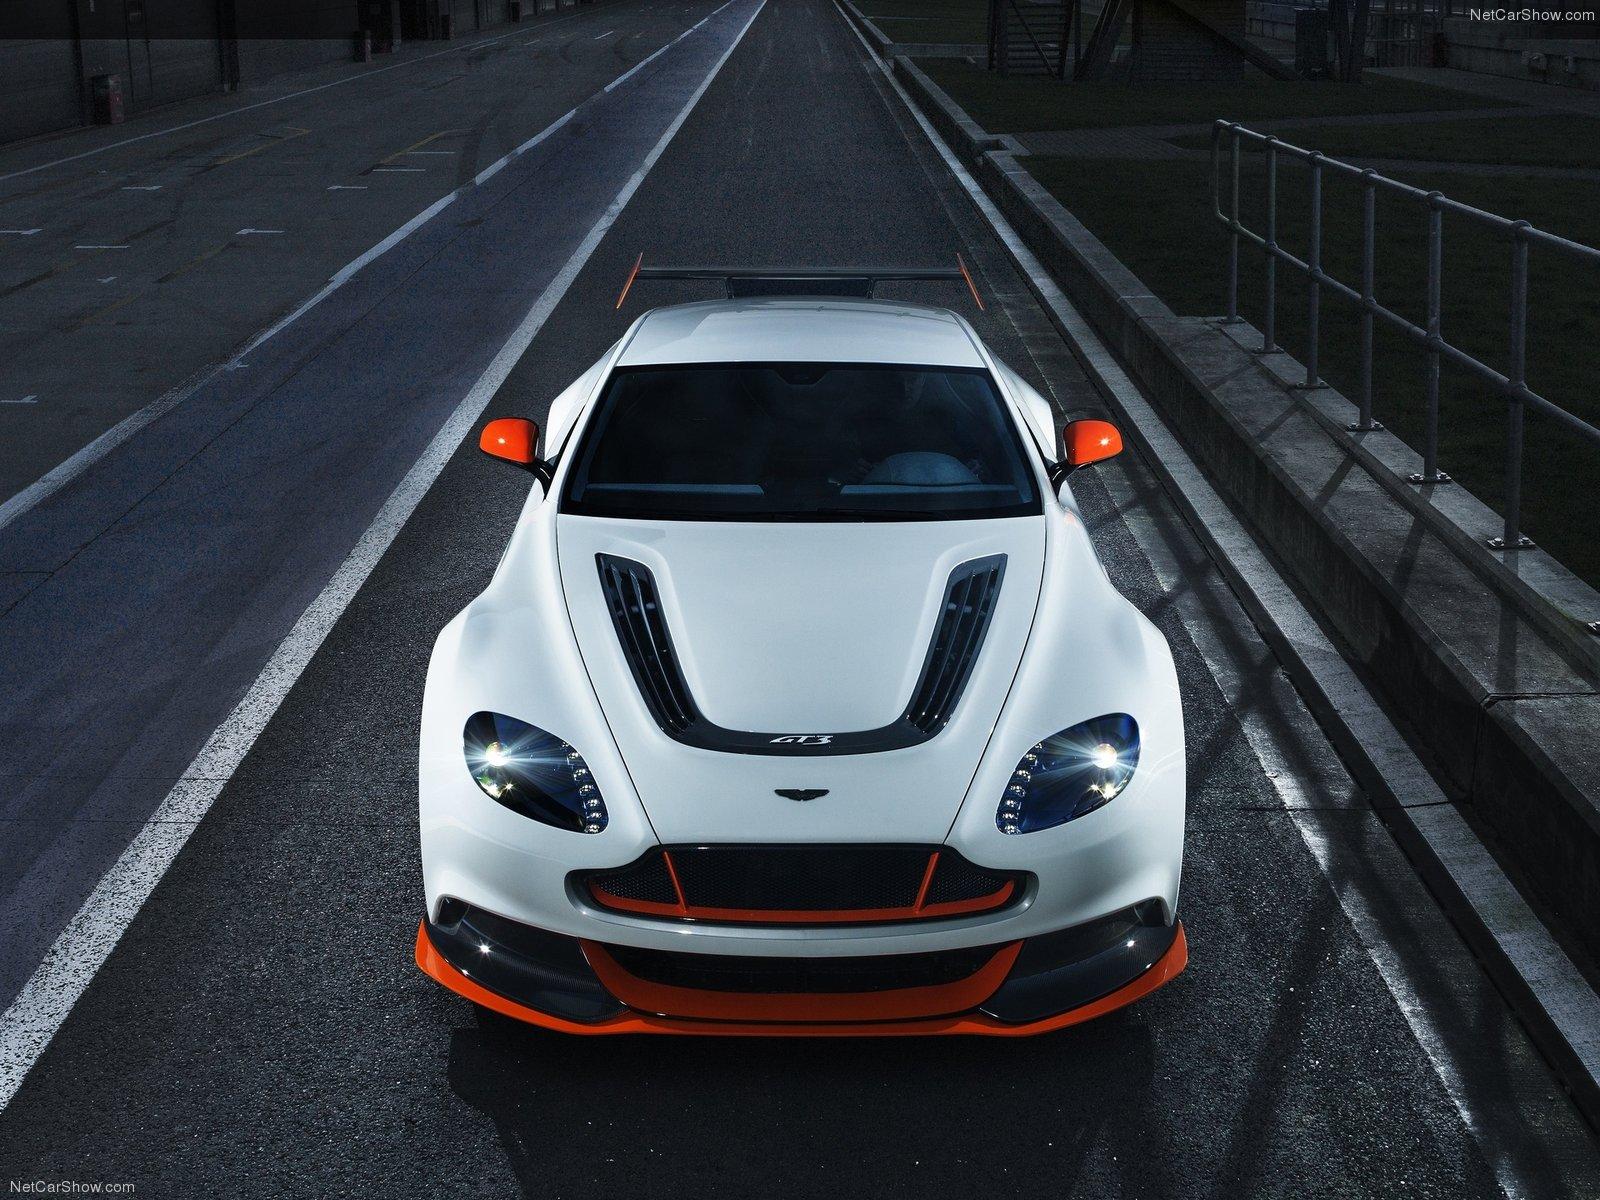 Aston_Martin-Vantage_GT3_Special_Edition_2015_1600x1200_wallpaper_06